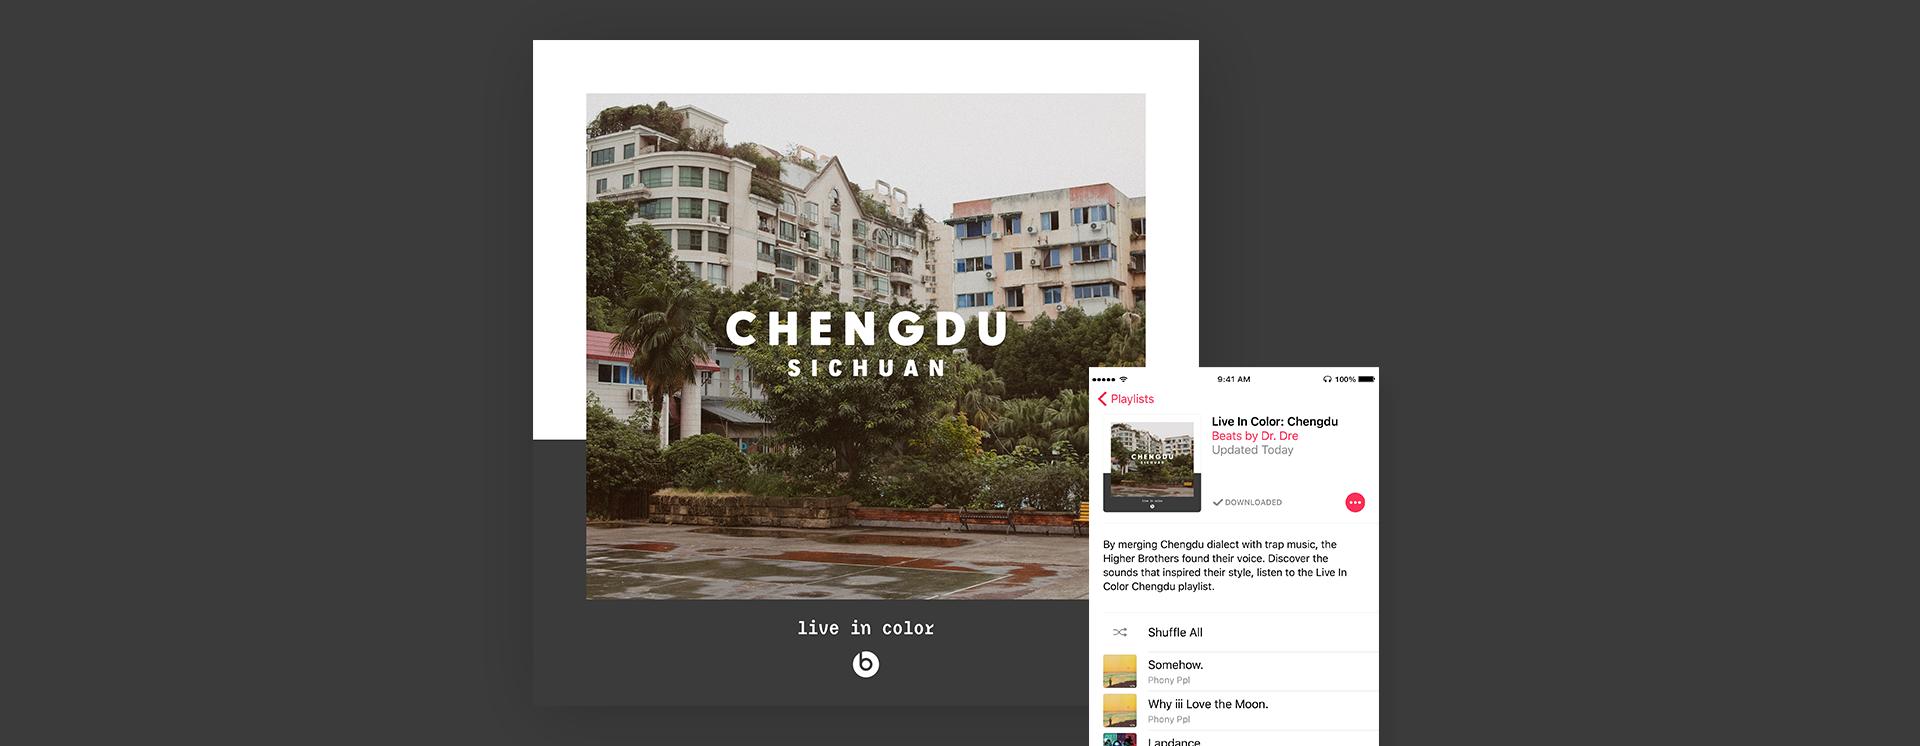 Playlist_Chengdu.png